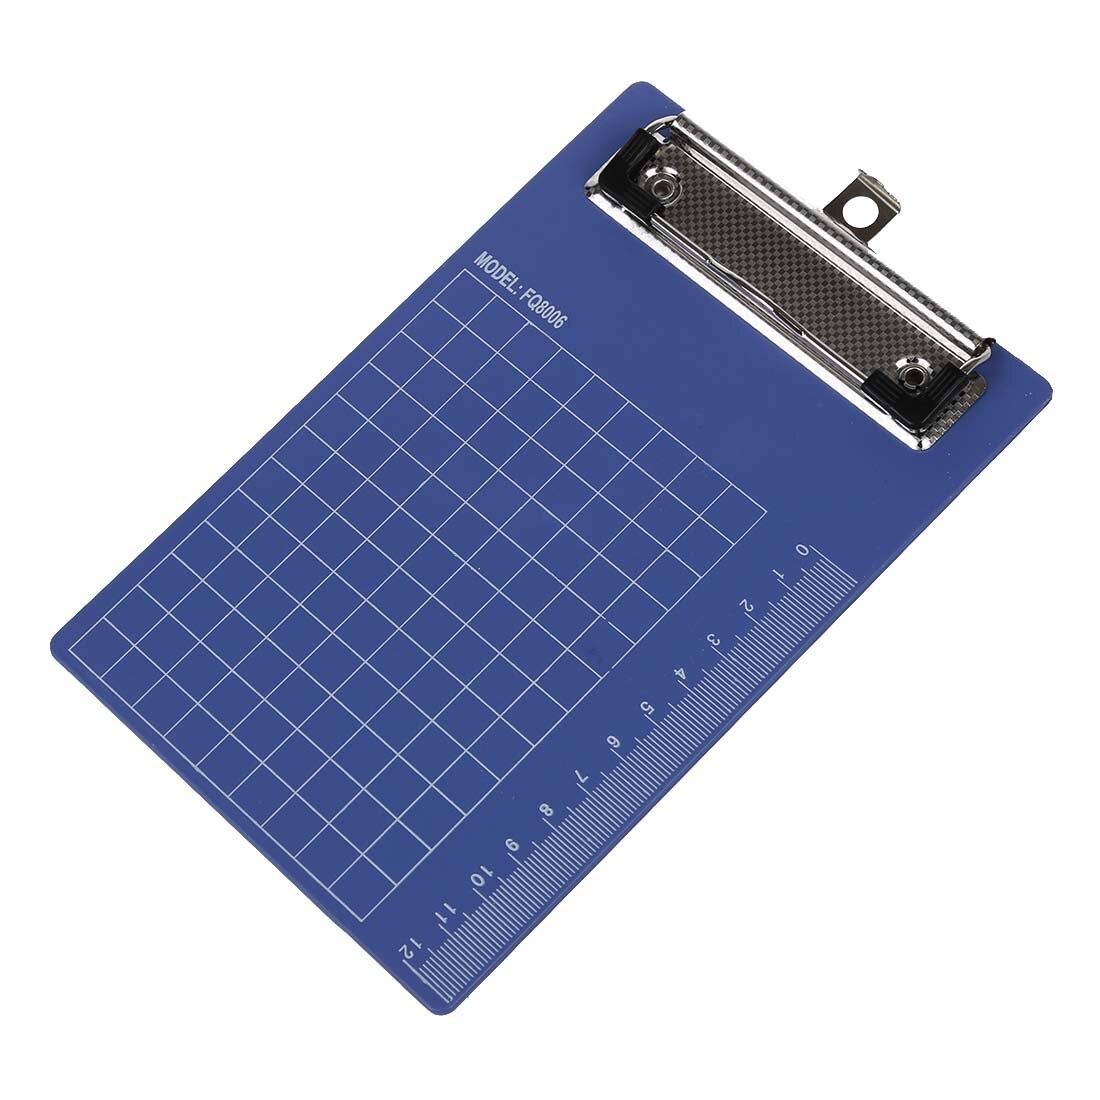 clipboard office paper holder clip. Pad Clip Holder Folder Plastic Clipboard Blue Purple For Paper A6 Office School SupplieChina M